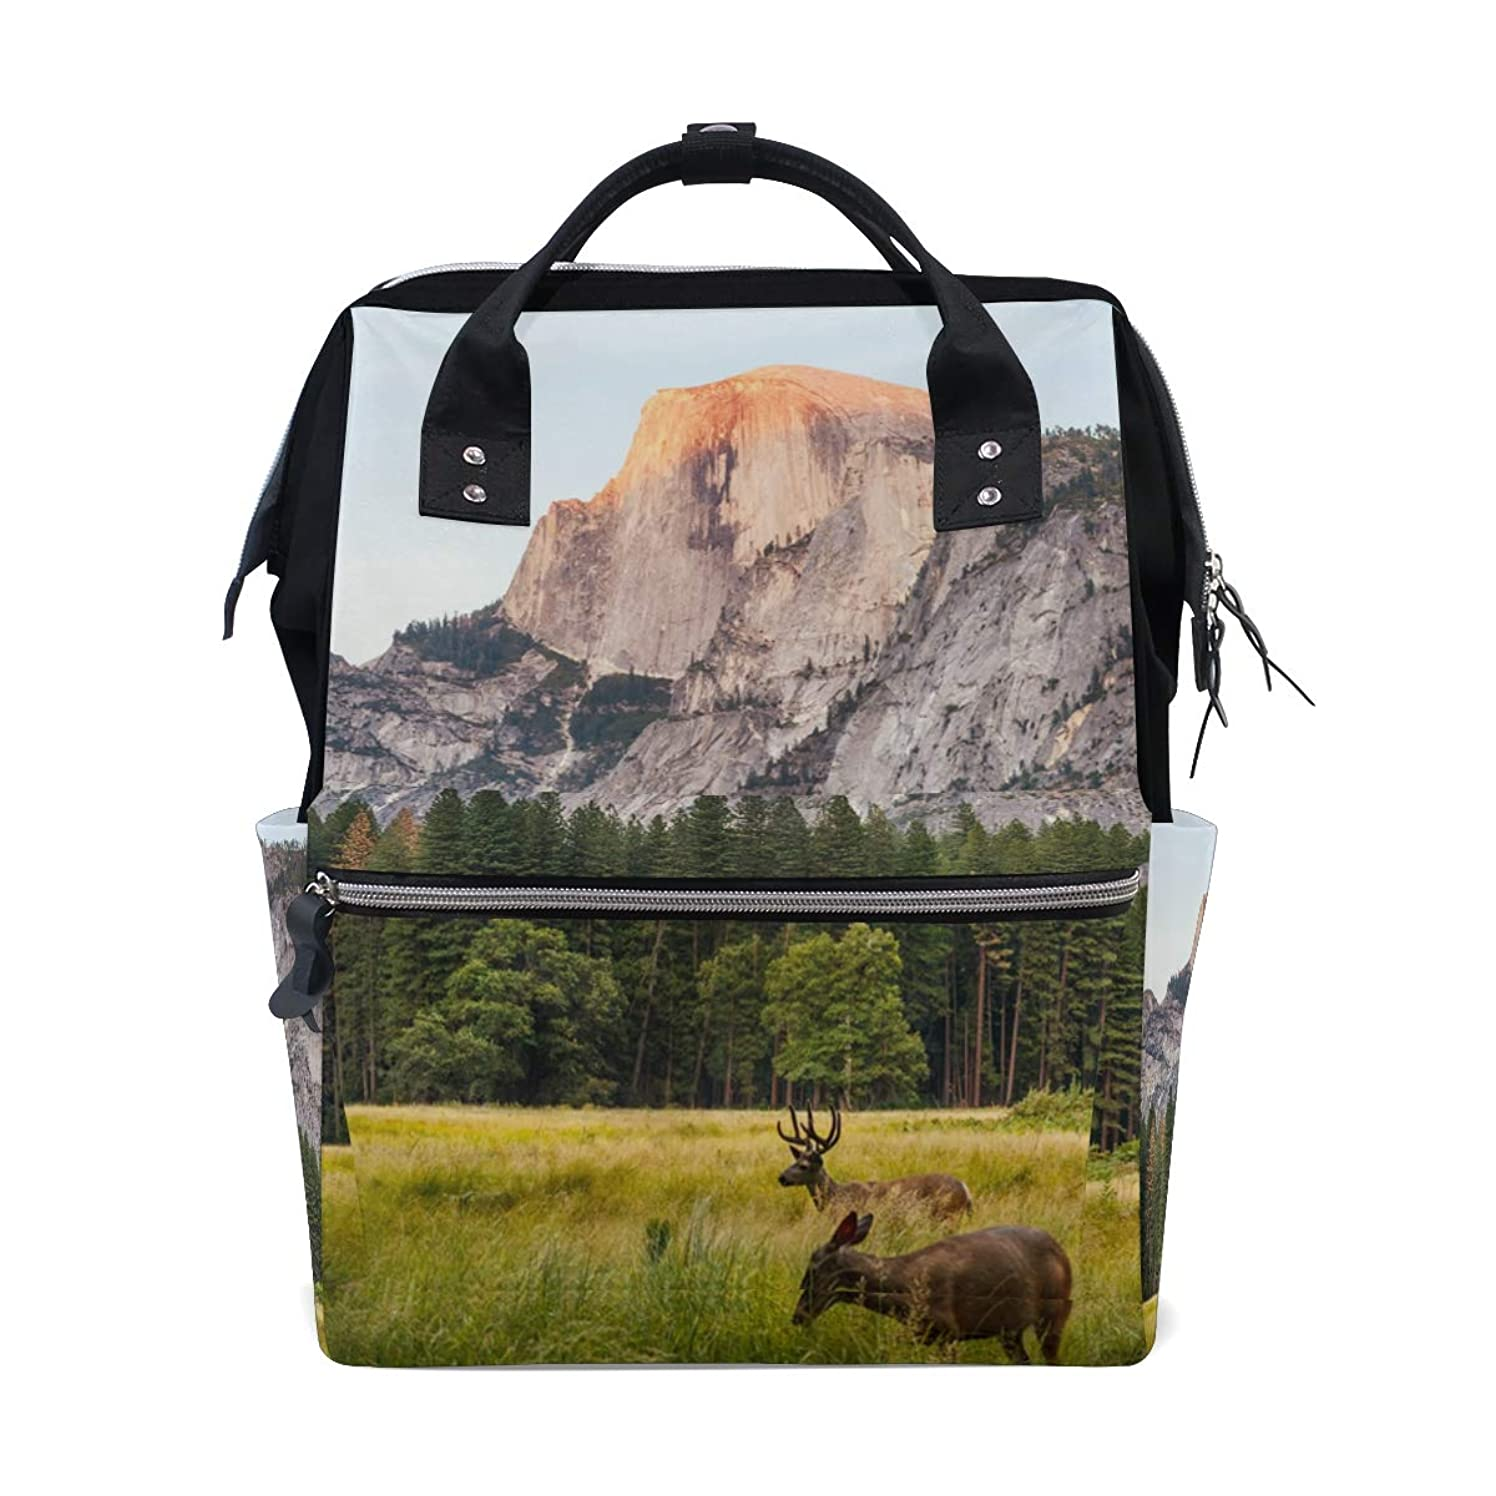 Backpack Mountain Tree Deer School Rucksack Diaper Bags Travel Shoulder Large Capacity Bookbag for Women Men